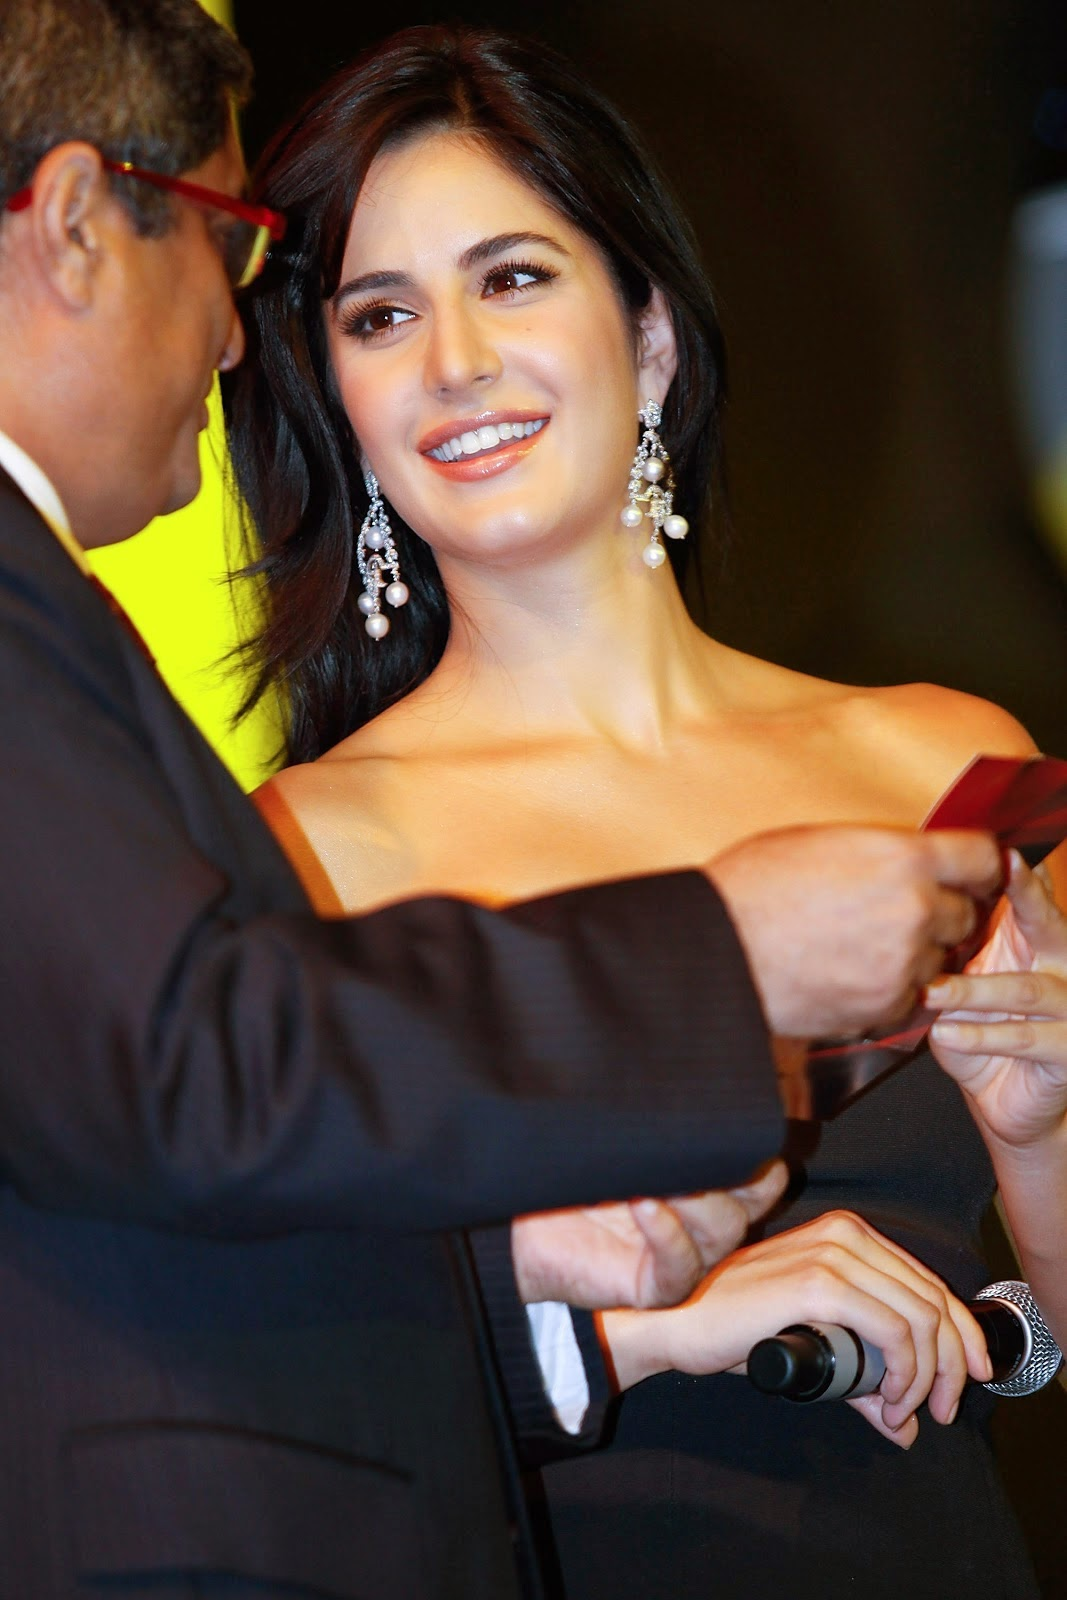 Katrina Kaif Looks Drop Dead Gorgeous In Black Skirt At The India Autocar Awards in Mumbai